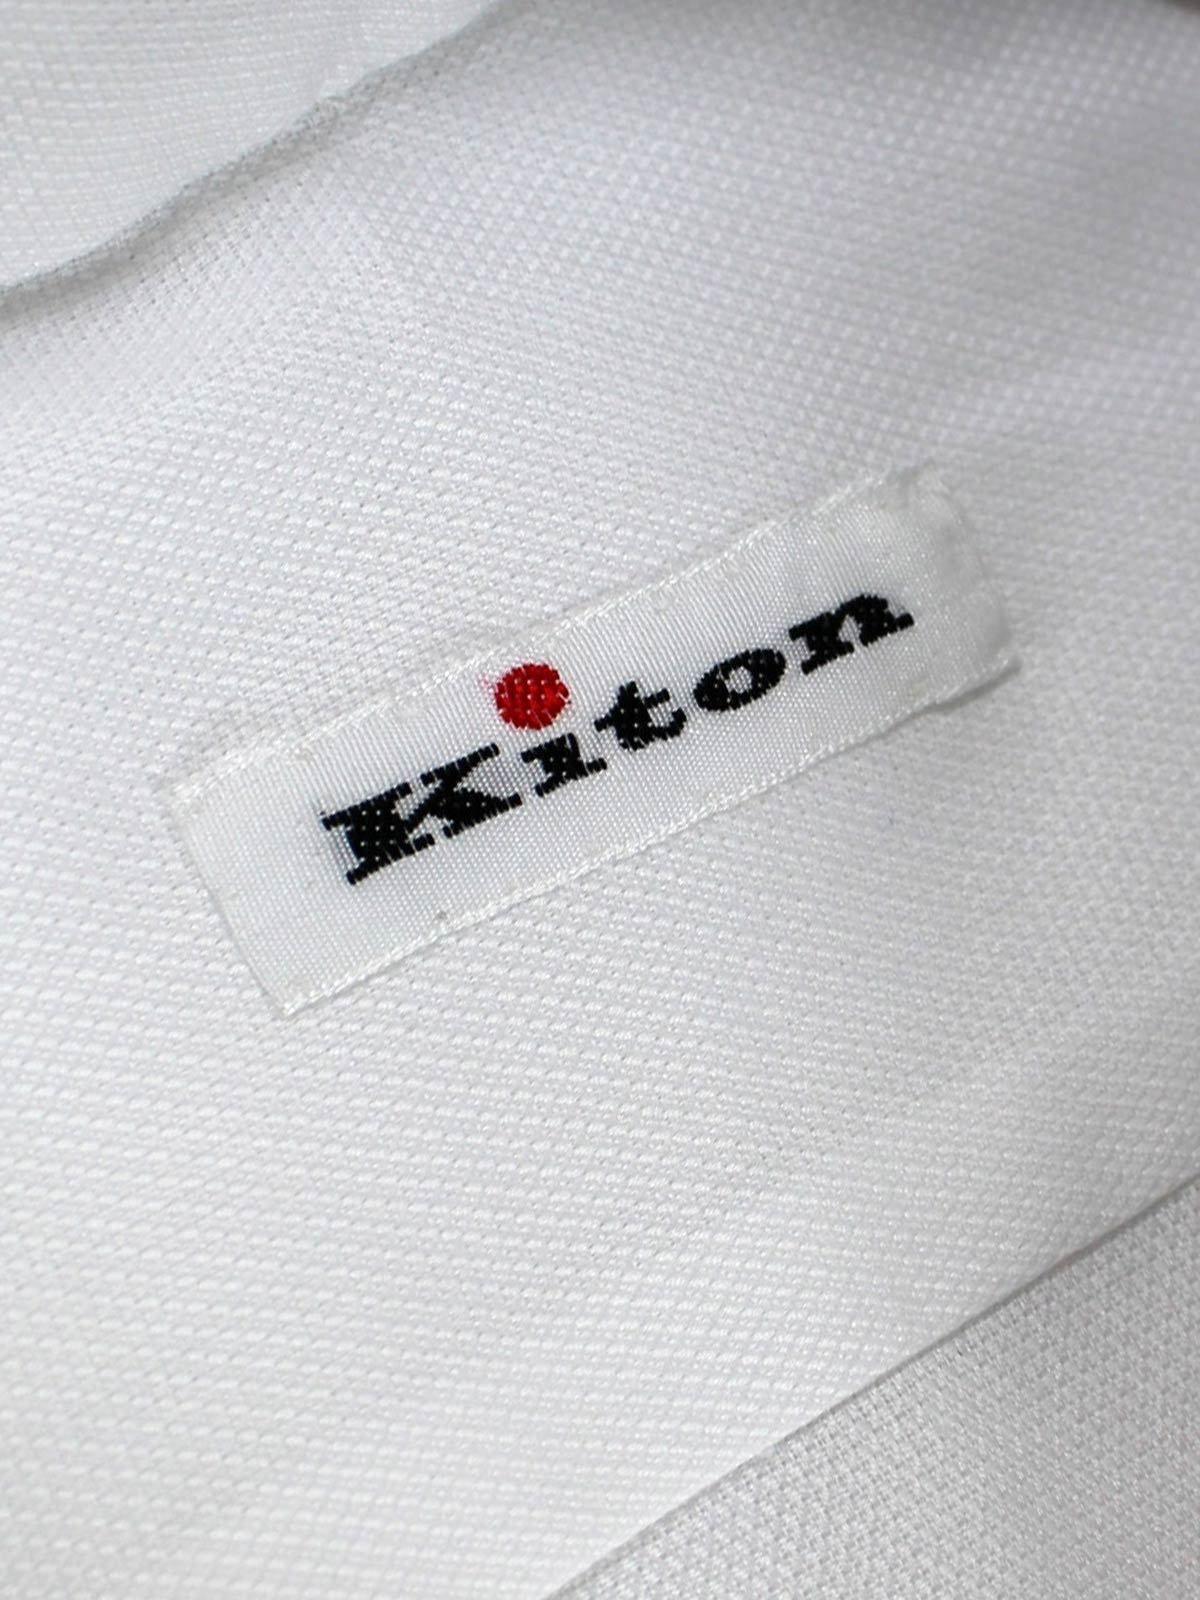 60aea694979b THe Best Dress Shirts In The World? Kiton Shirt White Sartorial Dress Shirt  - Tie Deals #kitonshirt